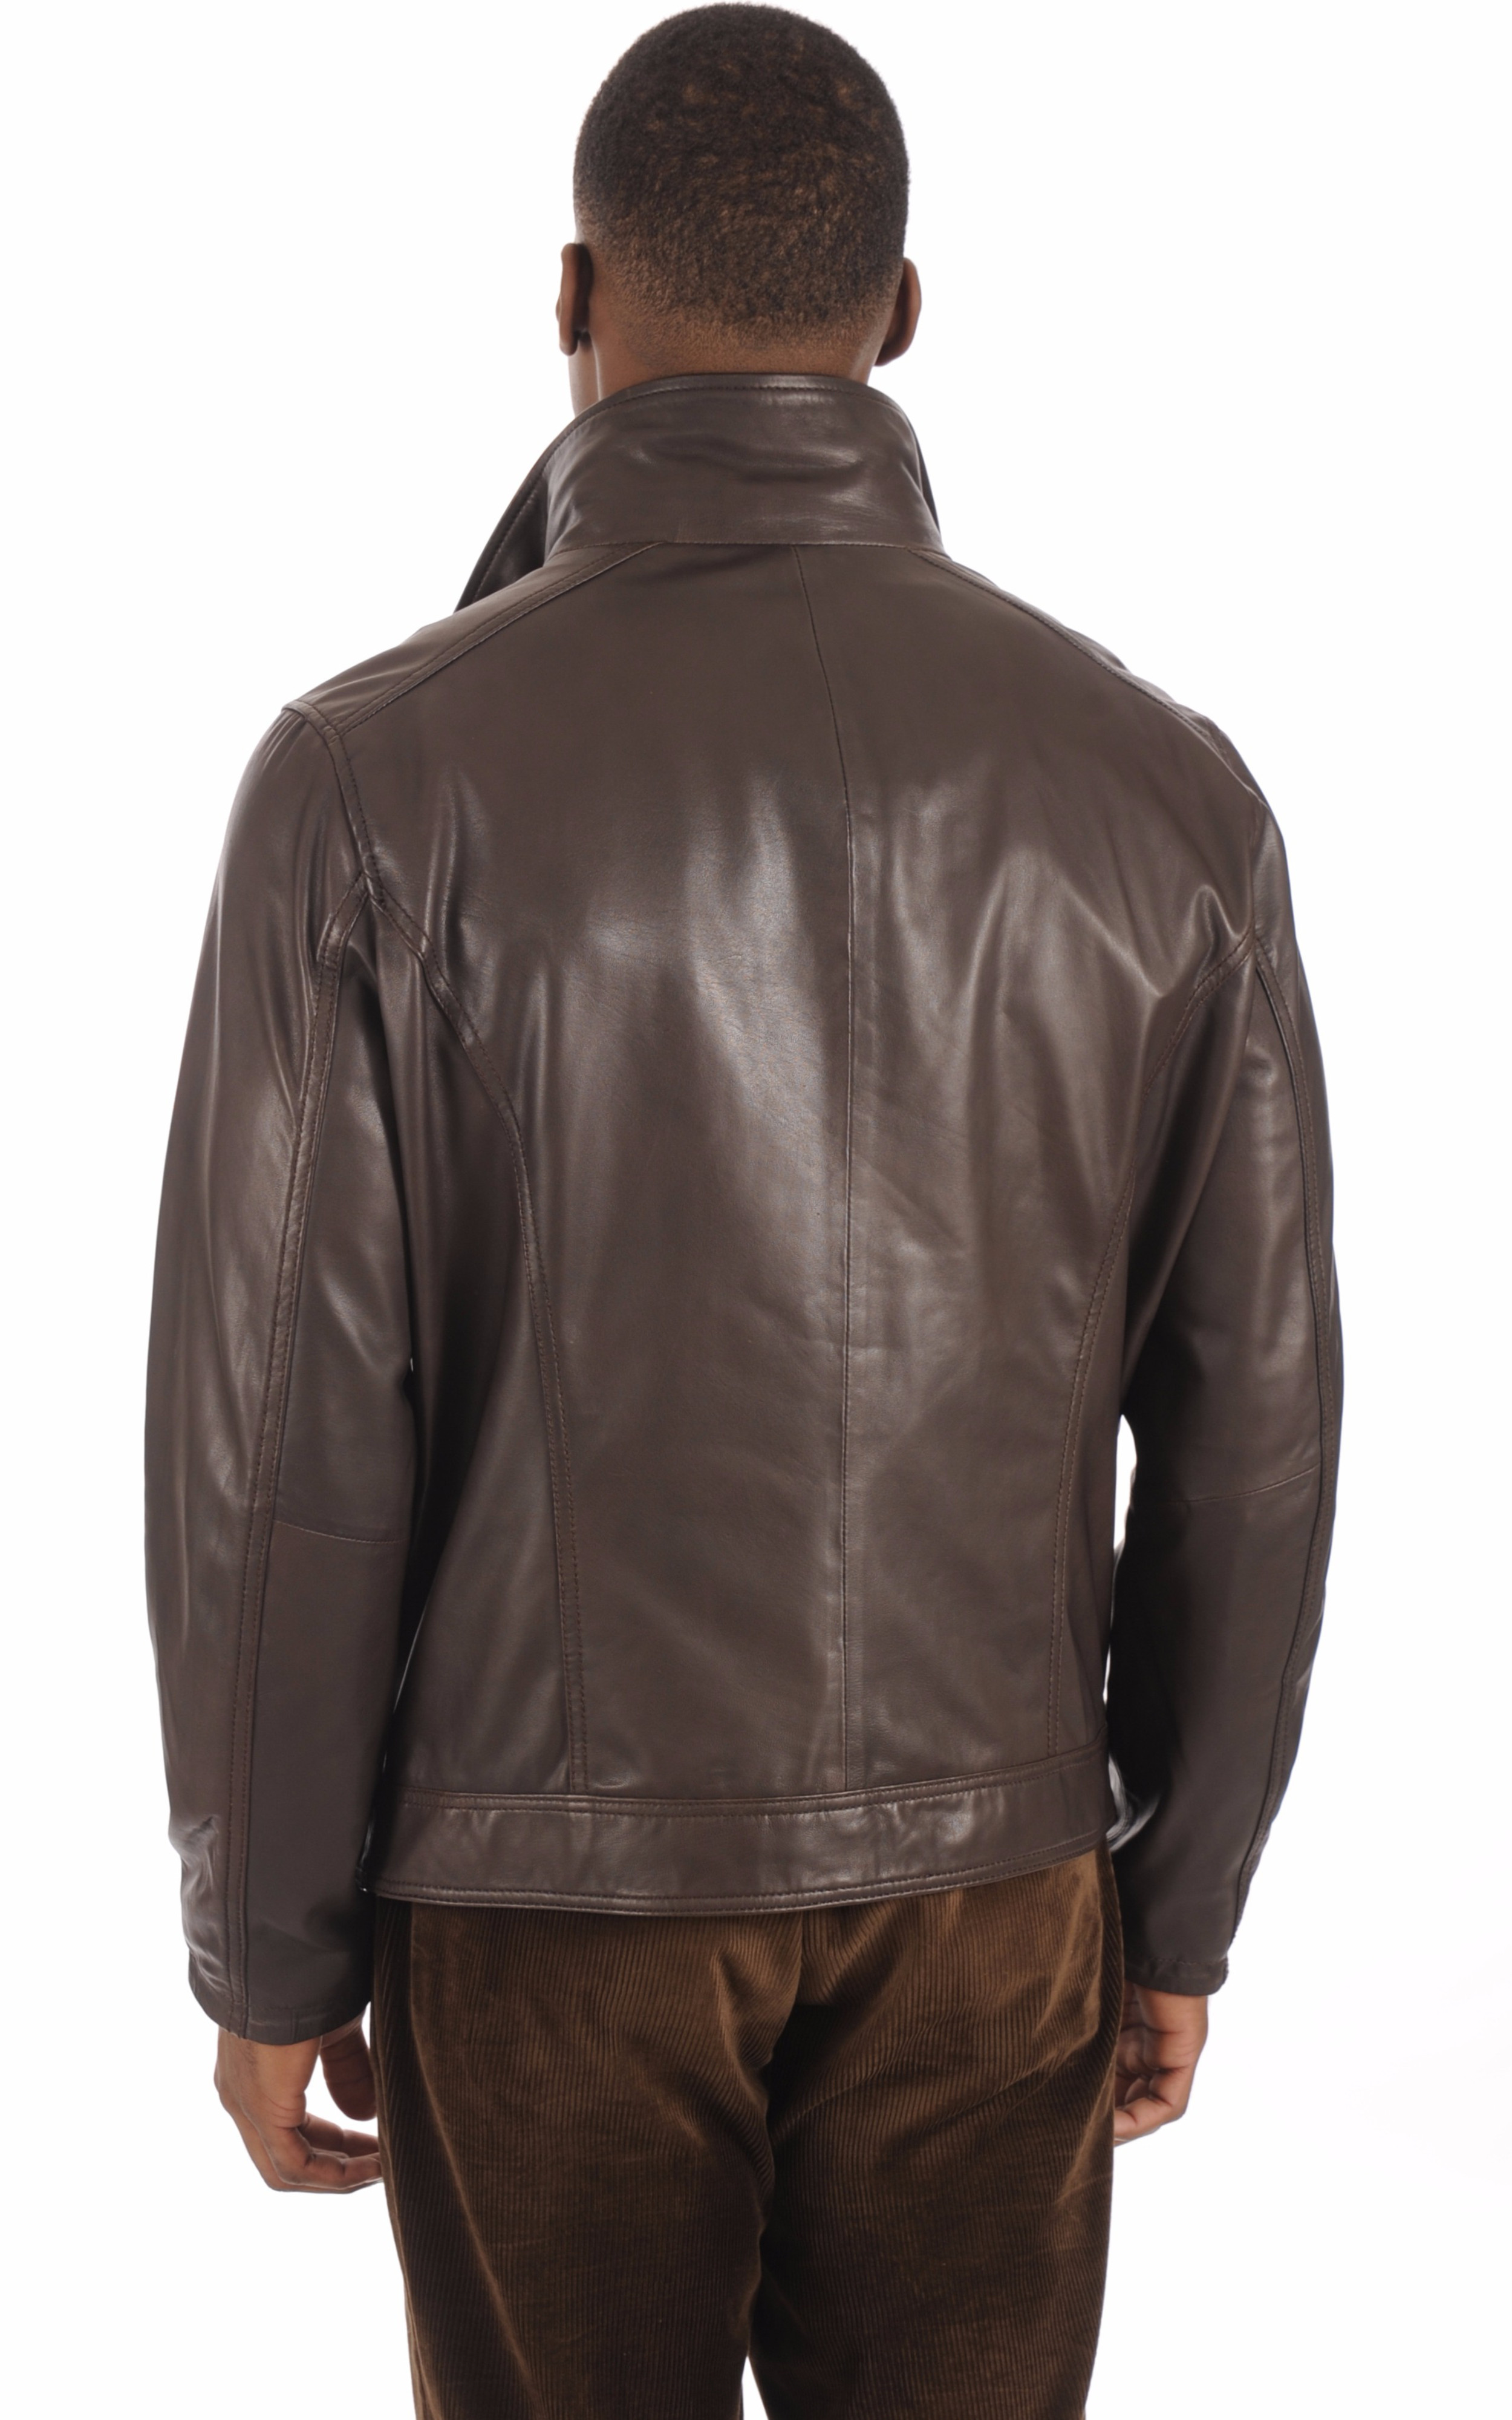 Blouson Confortable Marron Homme Daytona 73